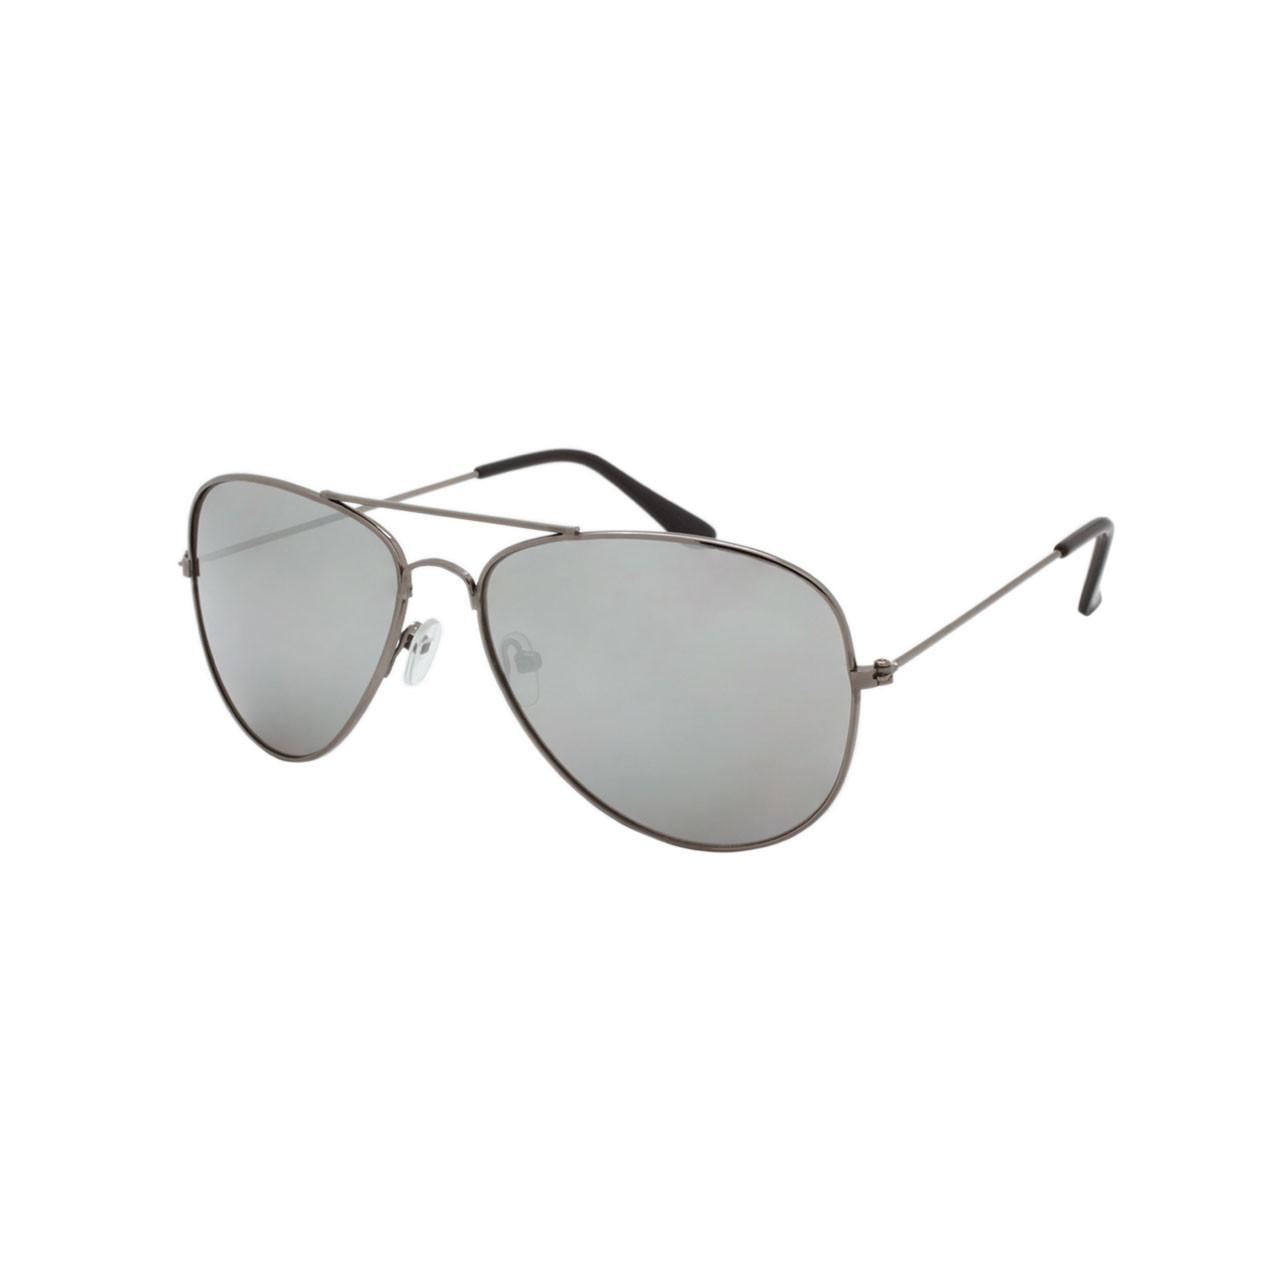 c82ae35e8060 Wholesale Smoke Color Metal UV400 Aviator Sunglasses Unisex Bulk